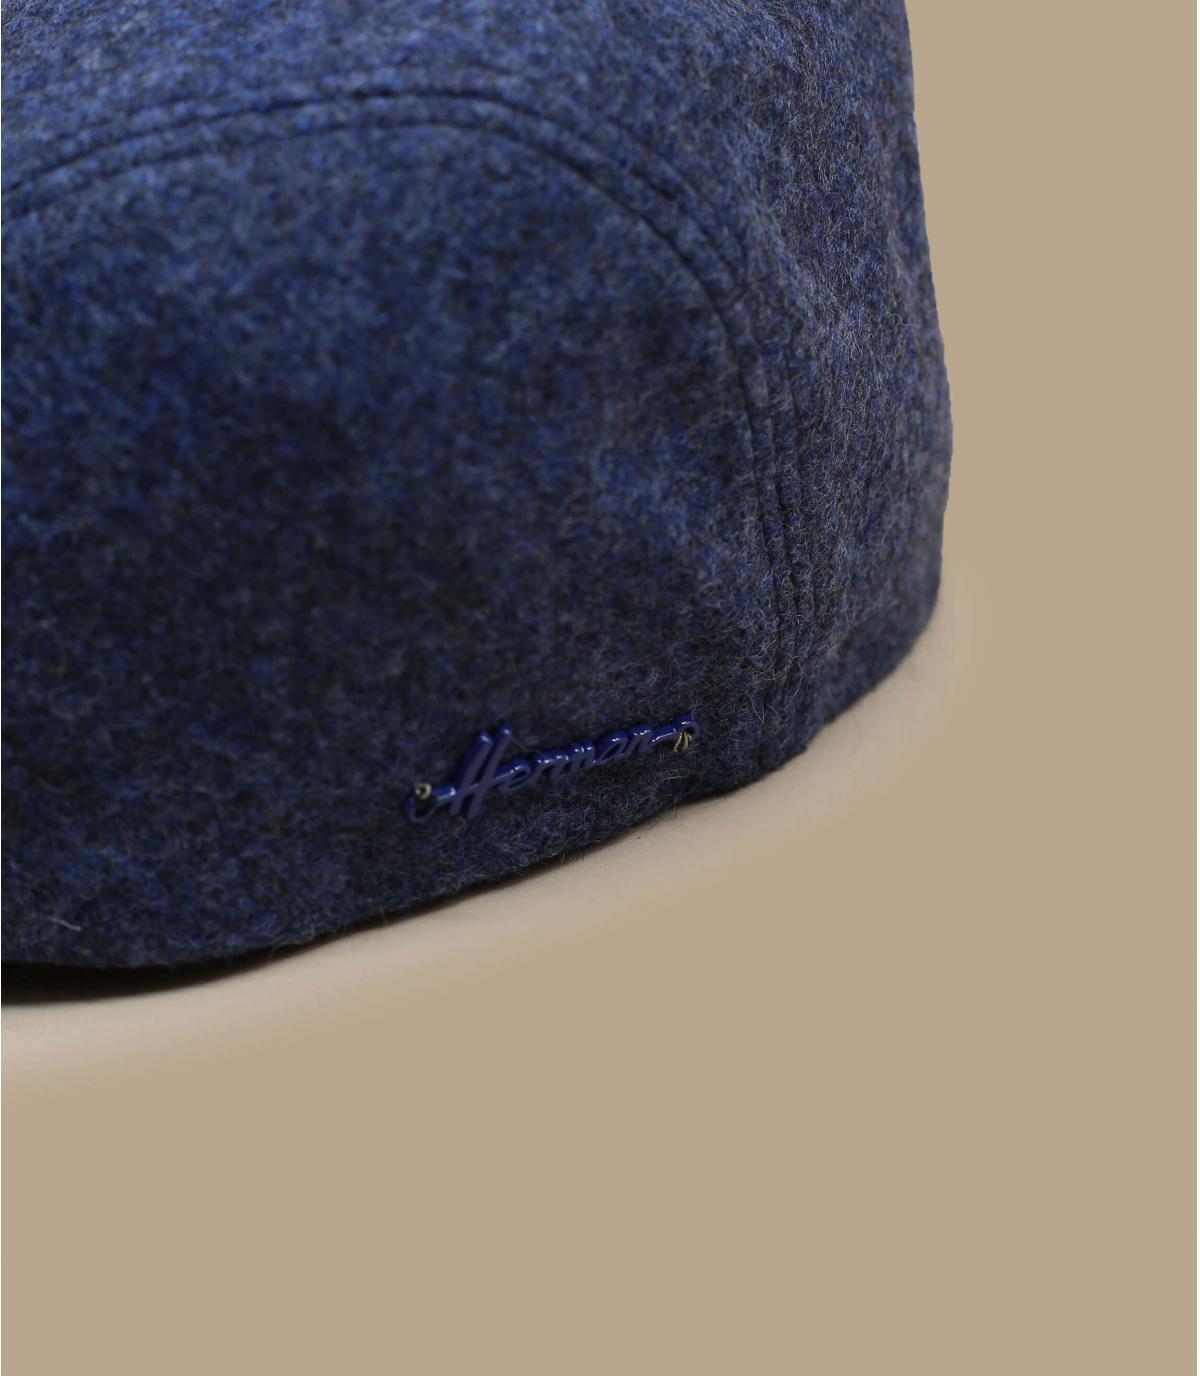 Details Range wool EF blue - afbeeling 2